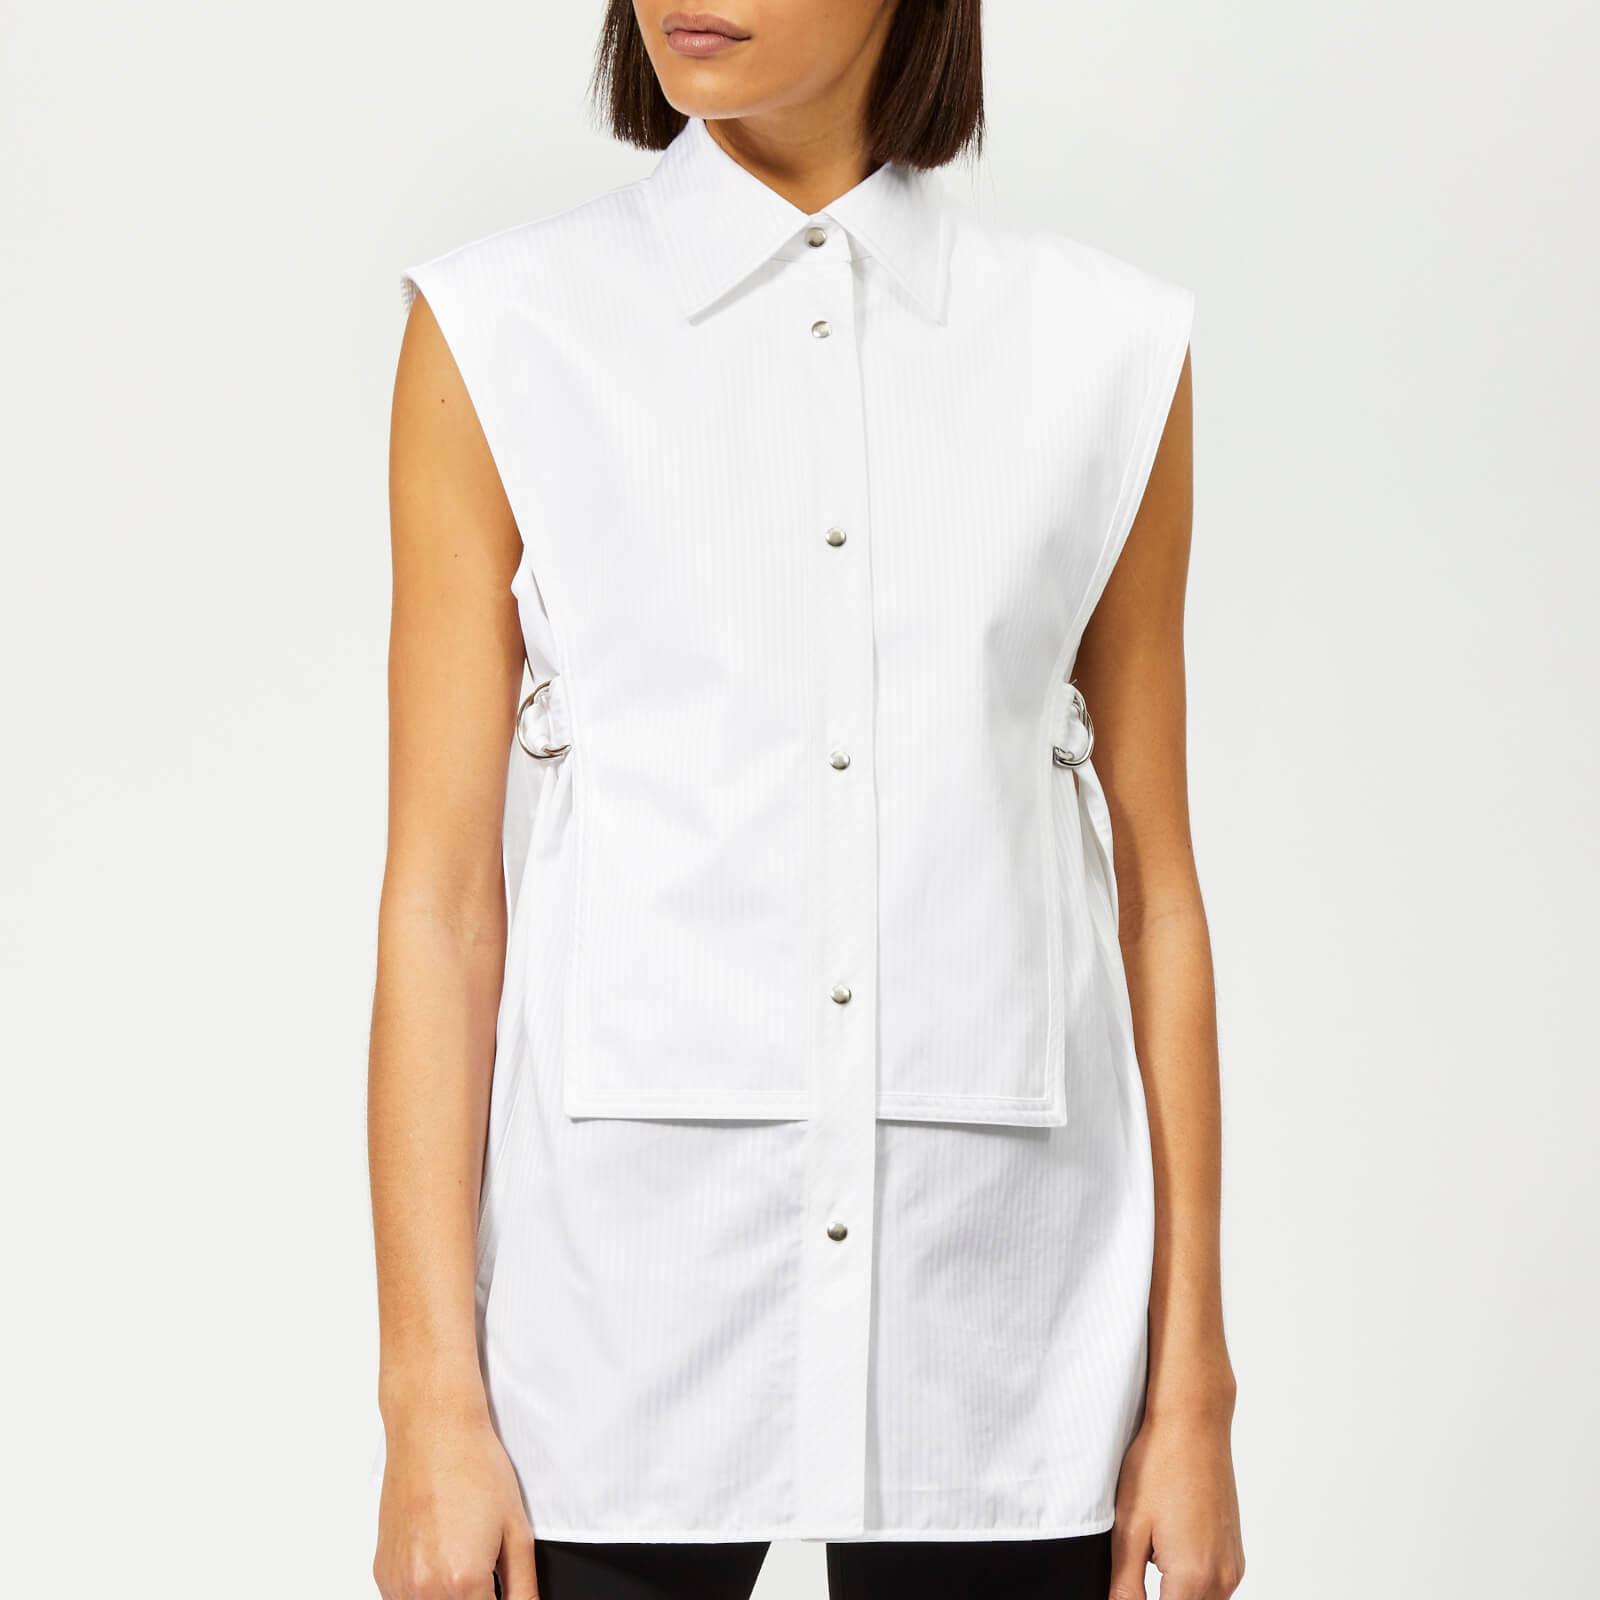 bcf35710 Helmut Lang Women's Sleeveless Bib Shirt - White Satin - Free UK Delivery  over £50